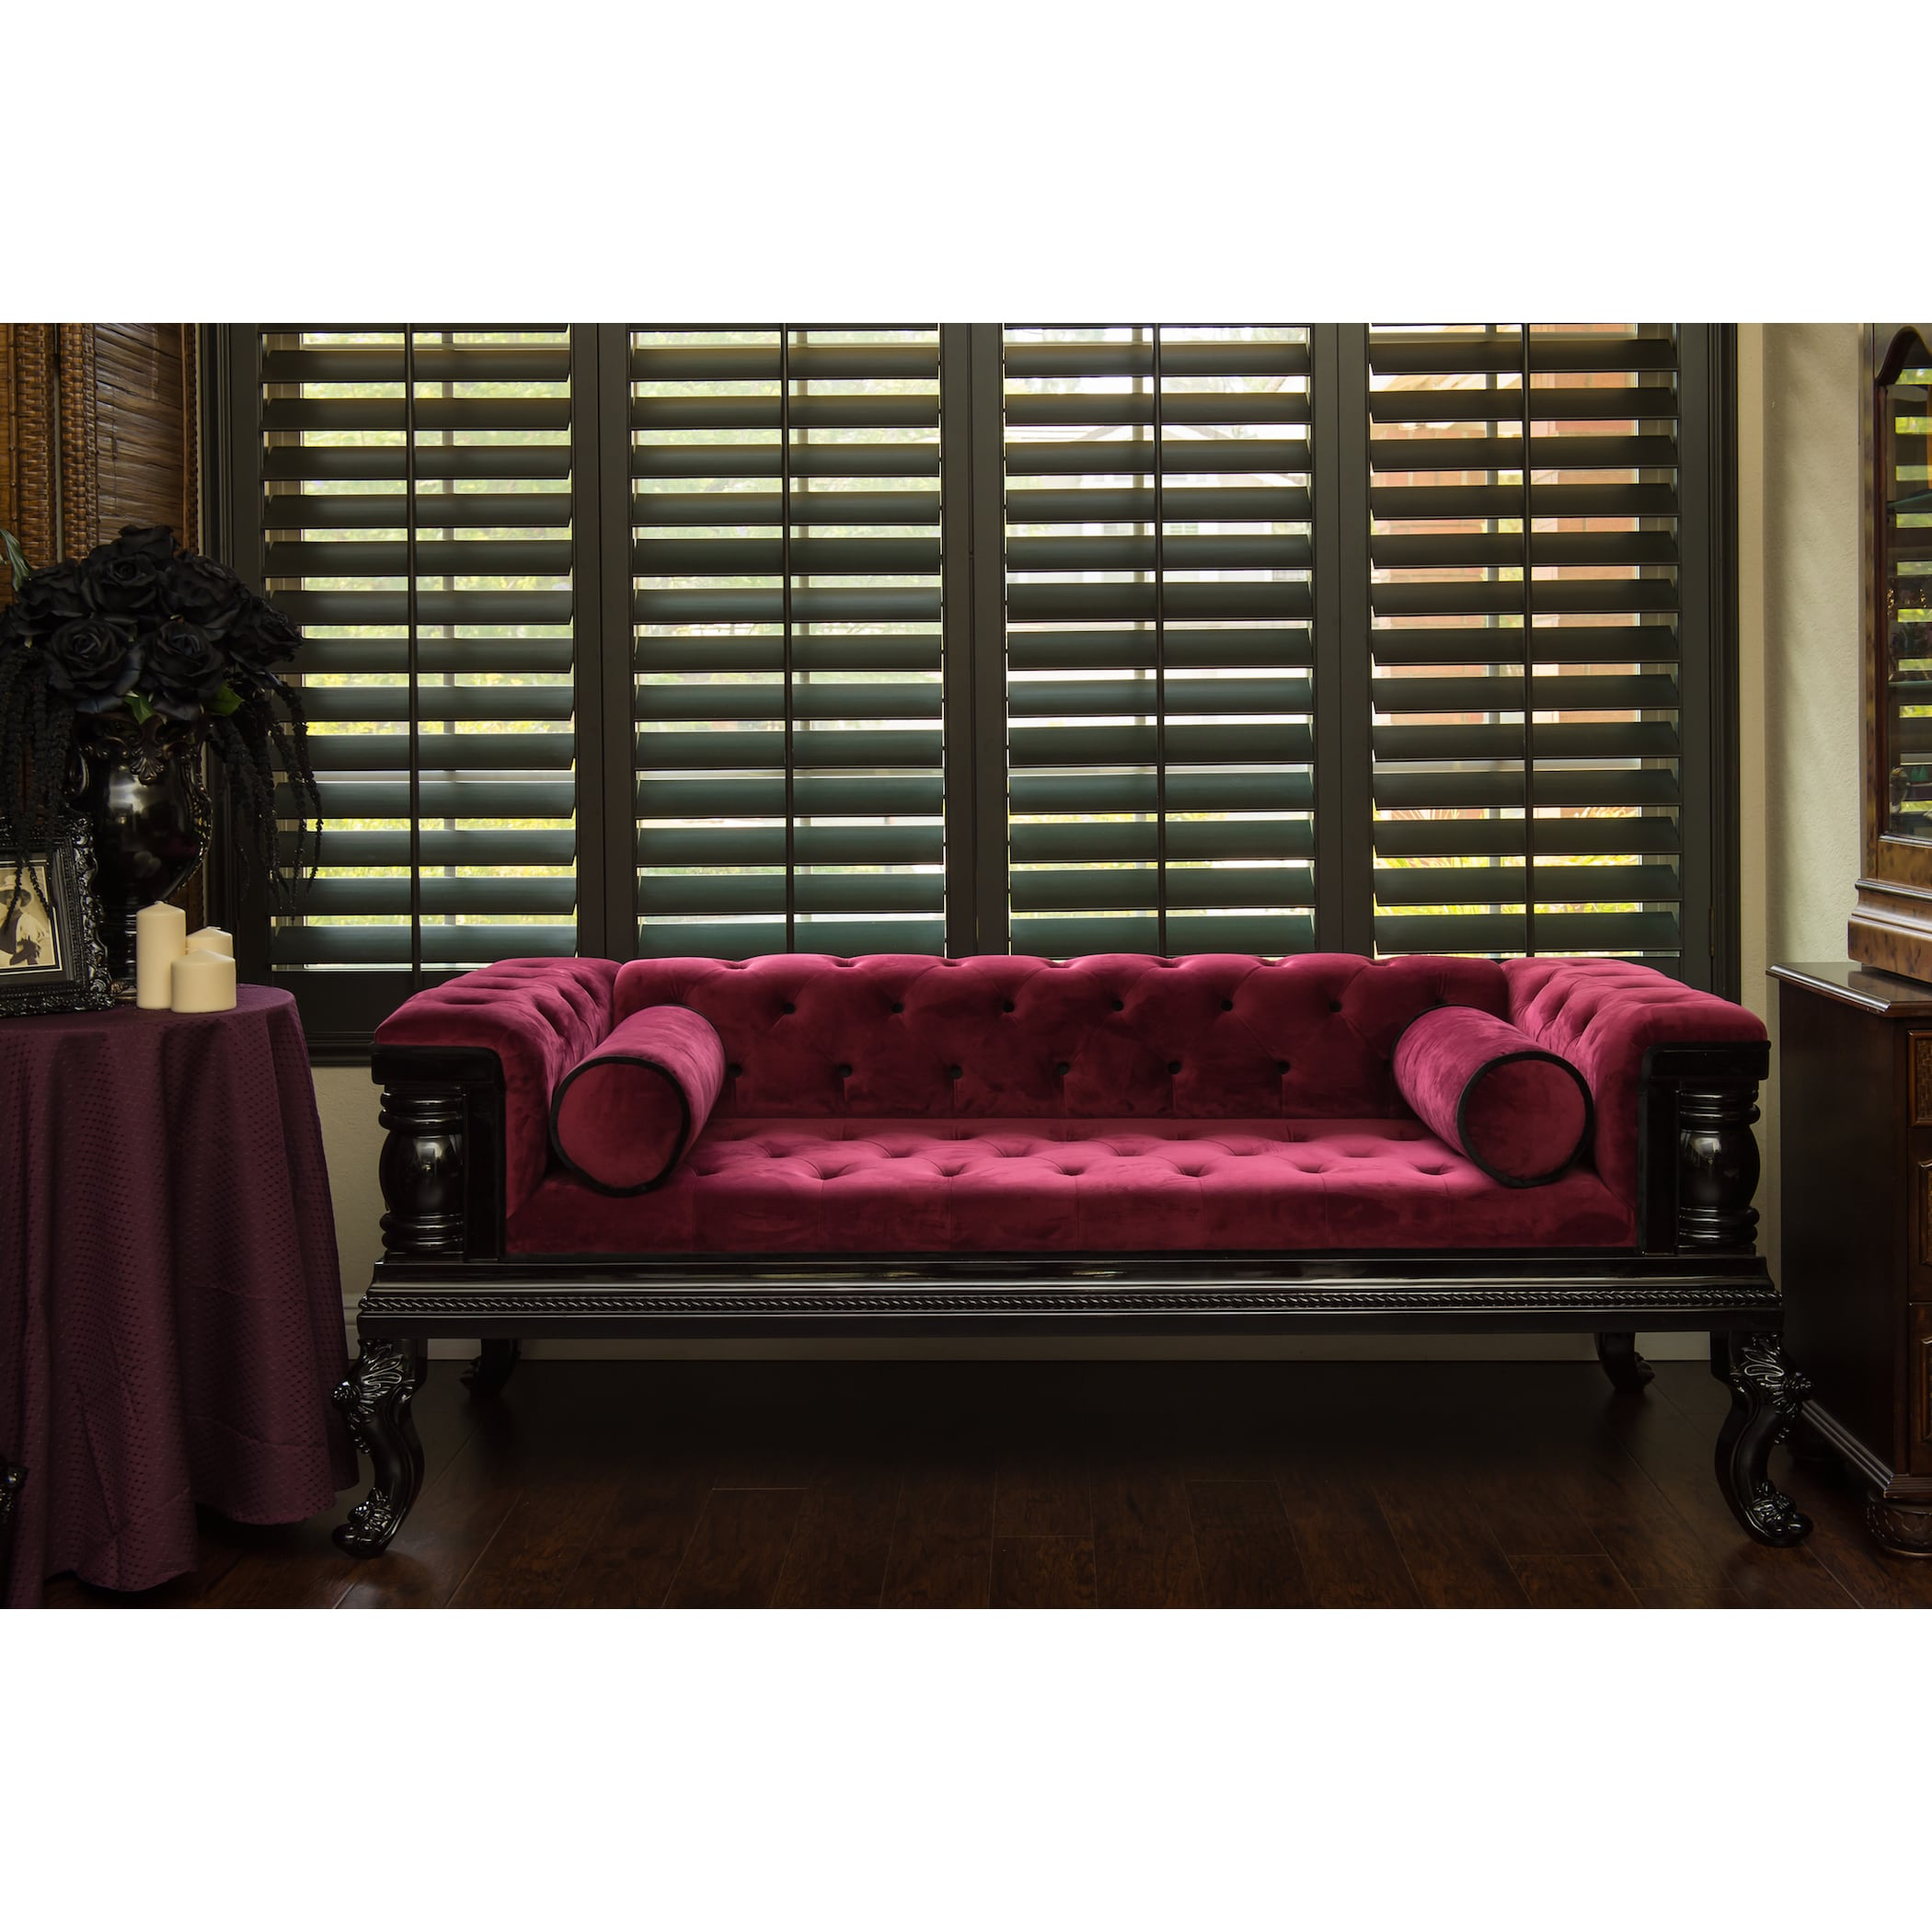 Apex Casket Company Gothic-Inspired Tufted Red Velvet Sofa